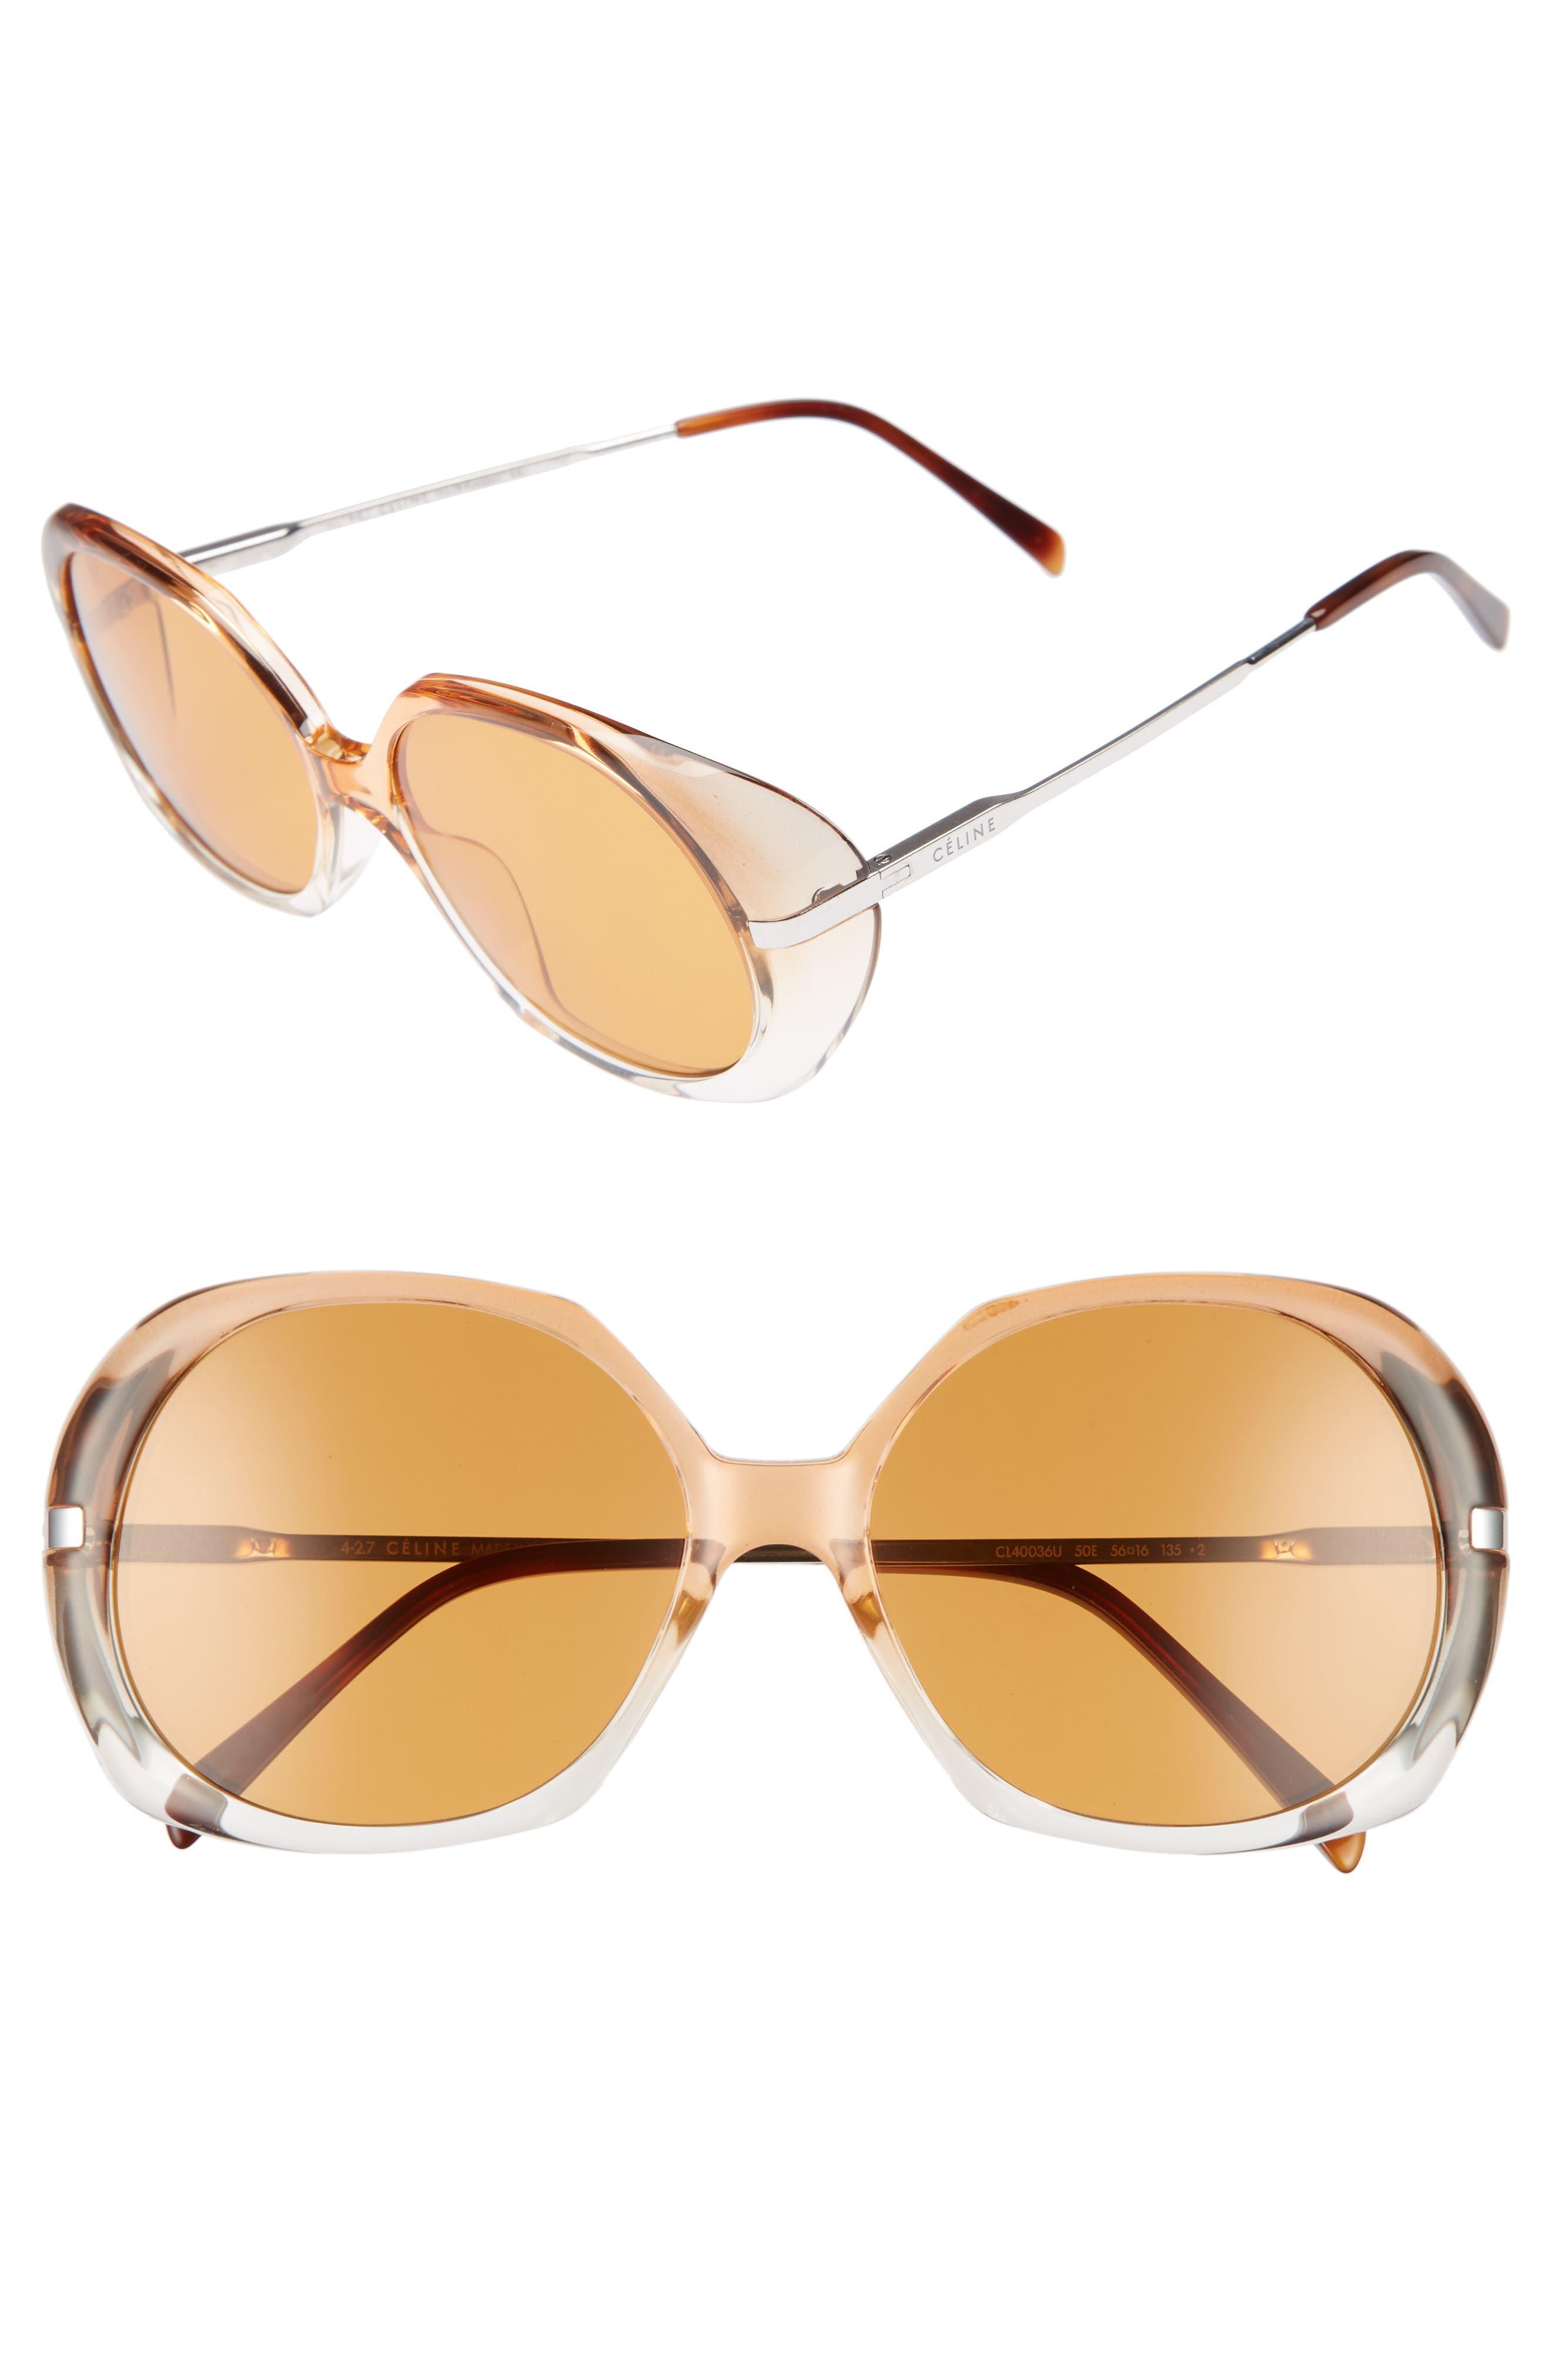 56mm Round Sunglasses,                         Main,                         color, 200